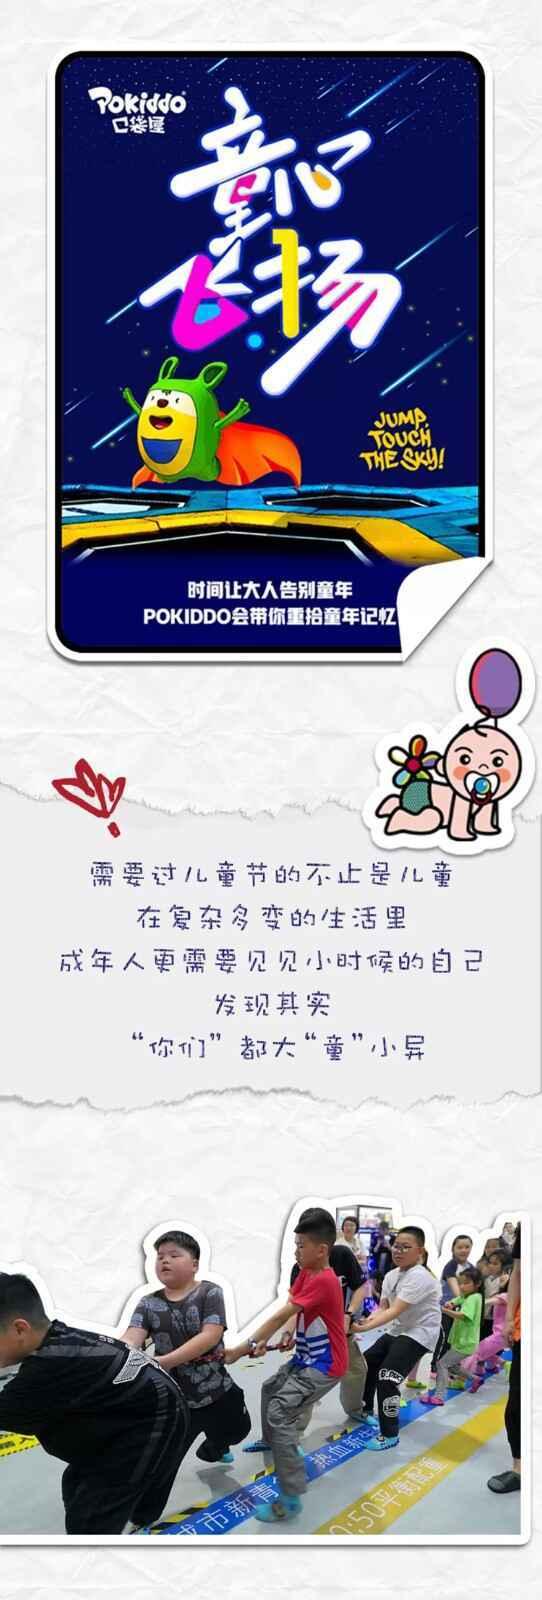 Pokiddo口袋屋运动工场六一儿童节.jpg